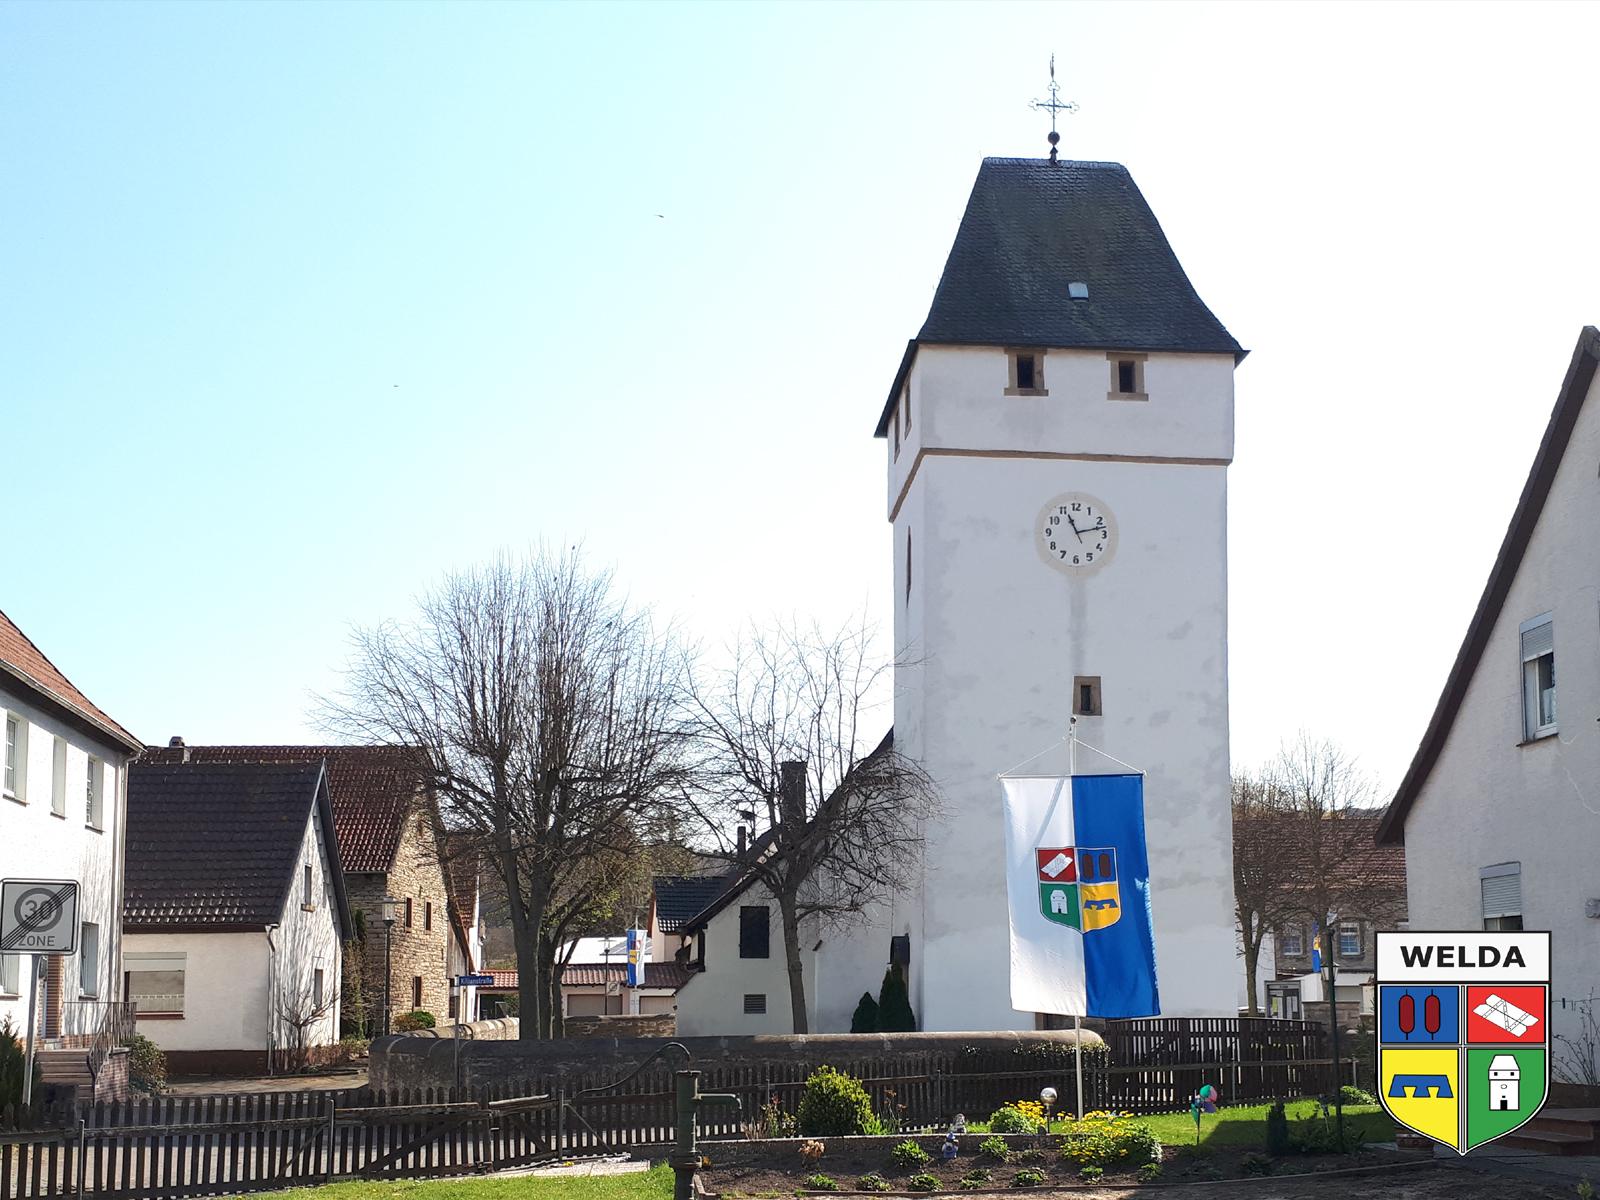 Welda St. Kilian Kirche